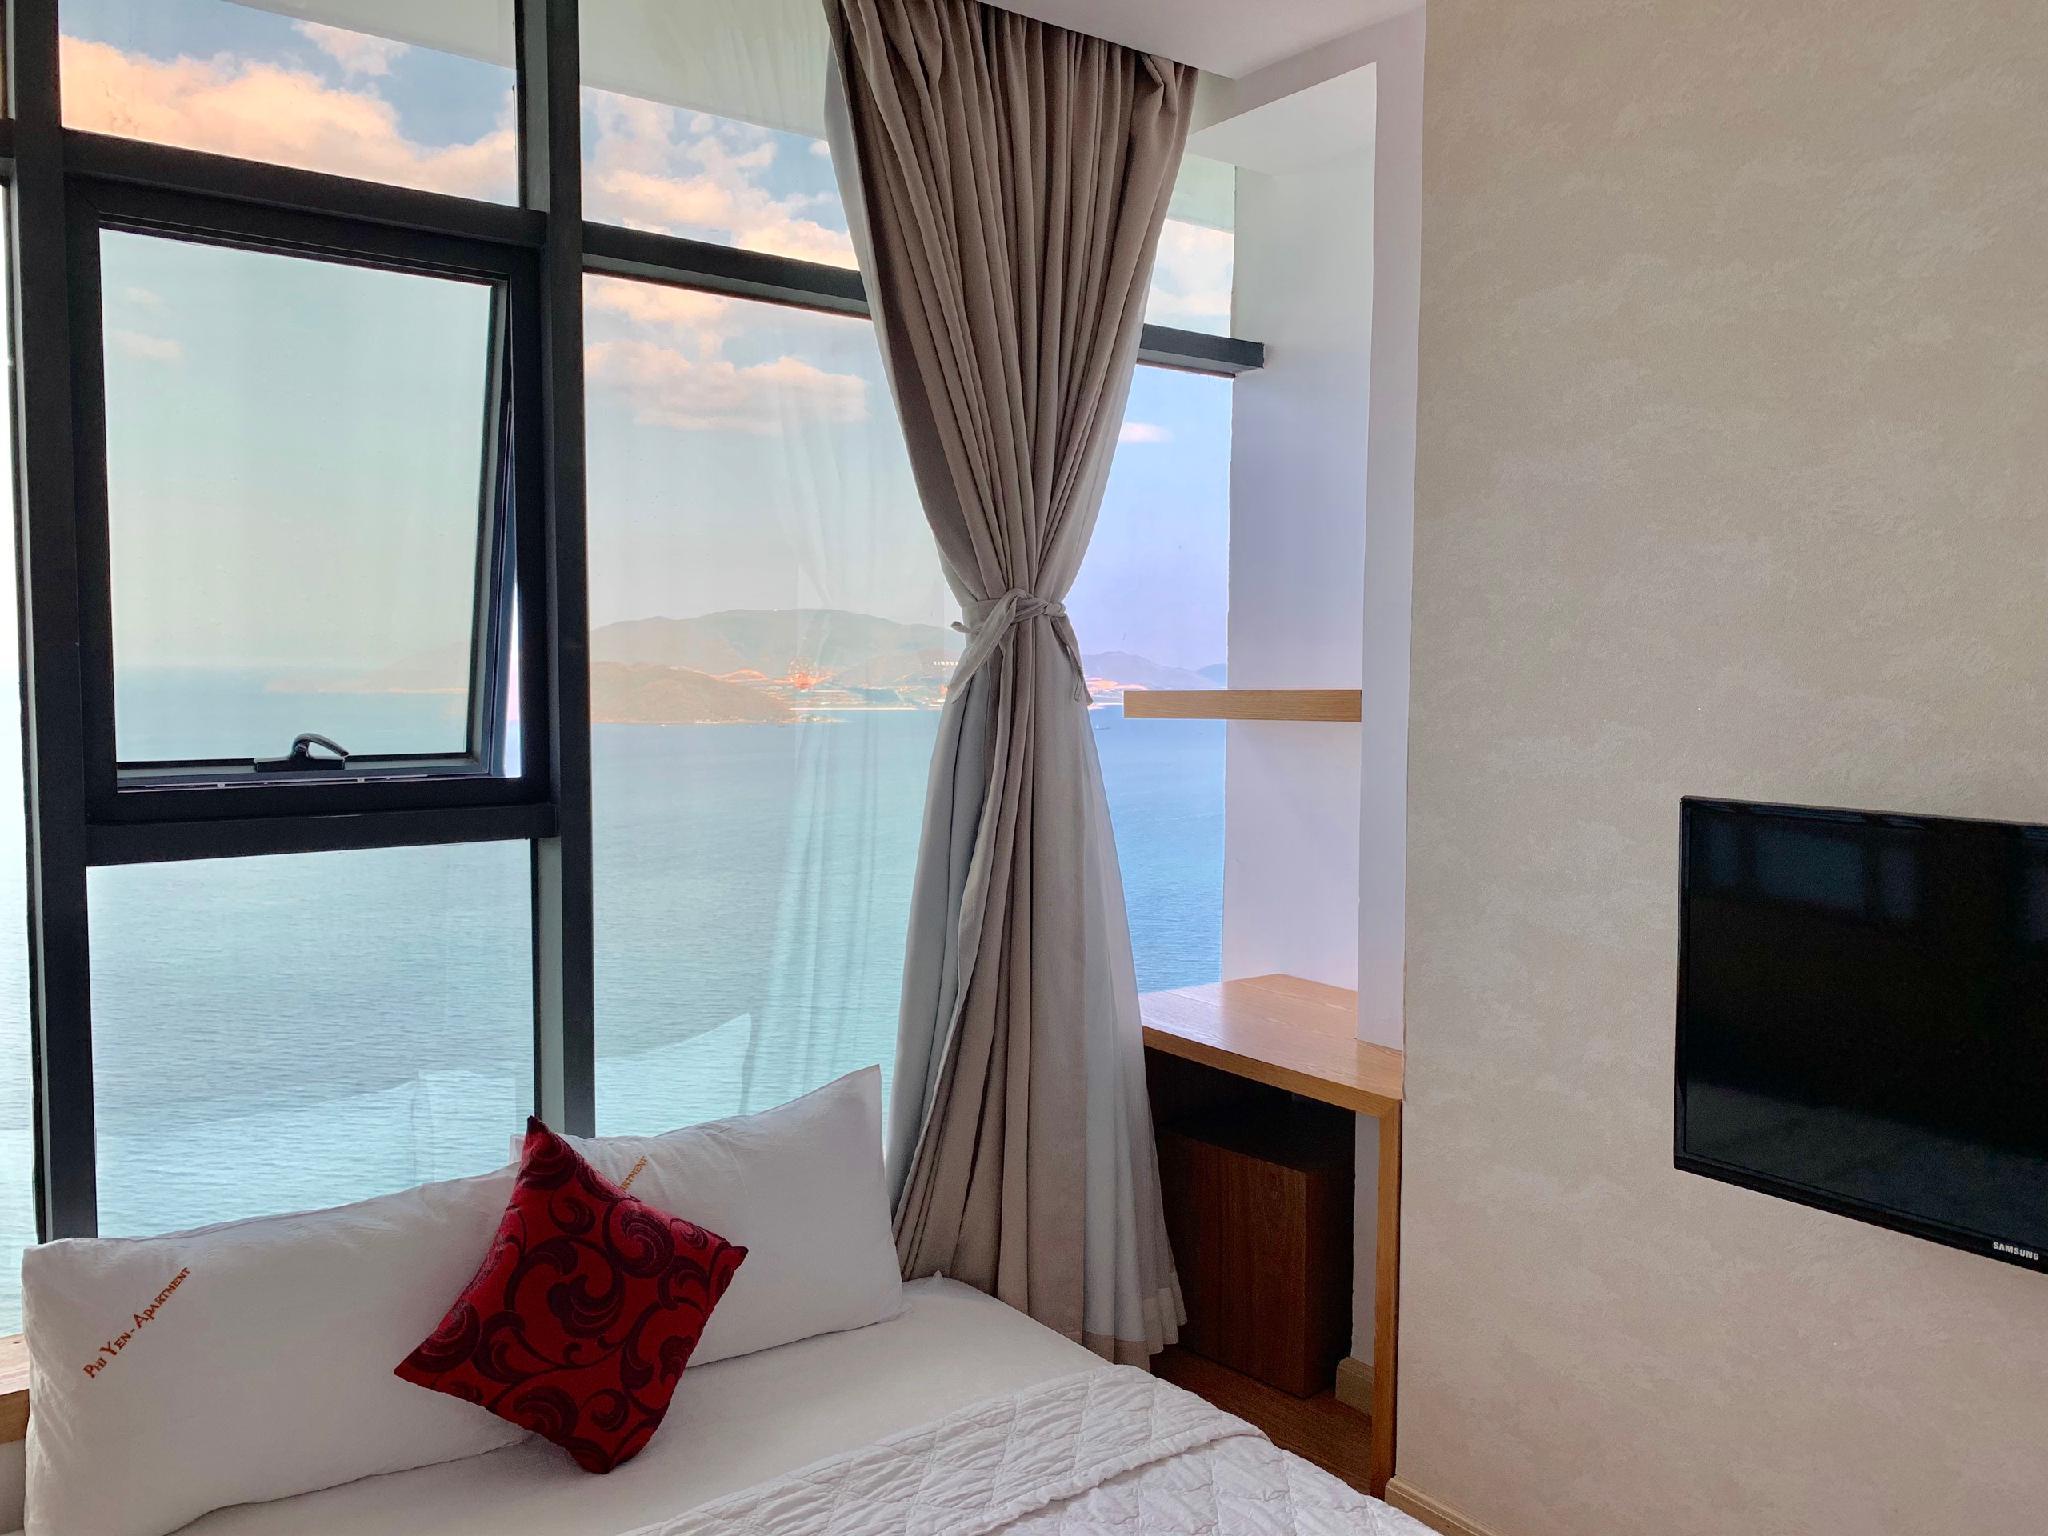 Two Beds Sea View Phi Yen Nha Trang Apartment